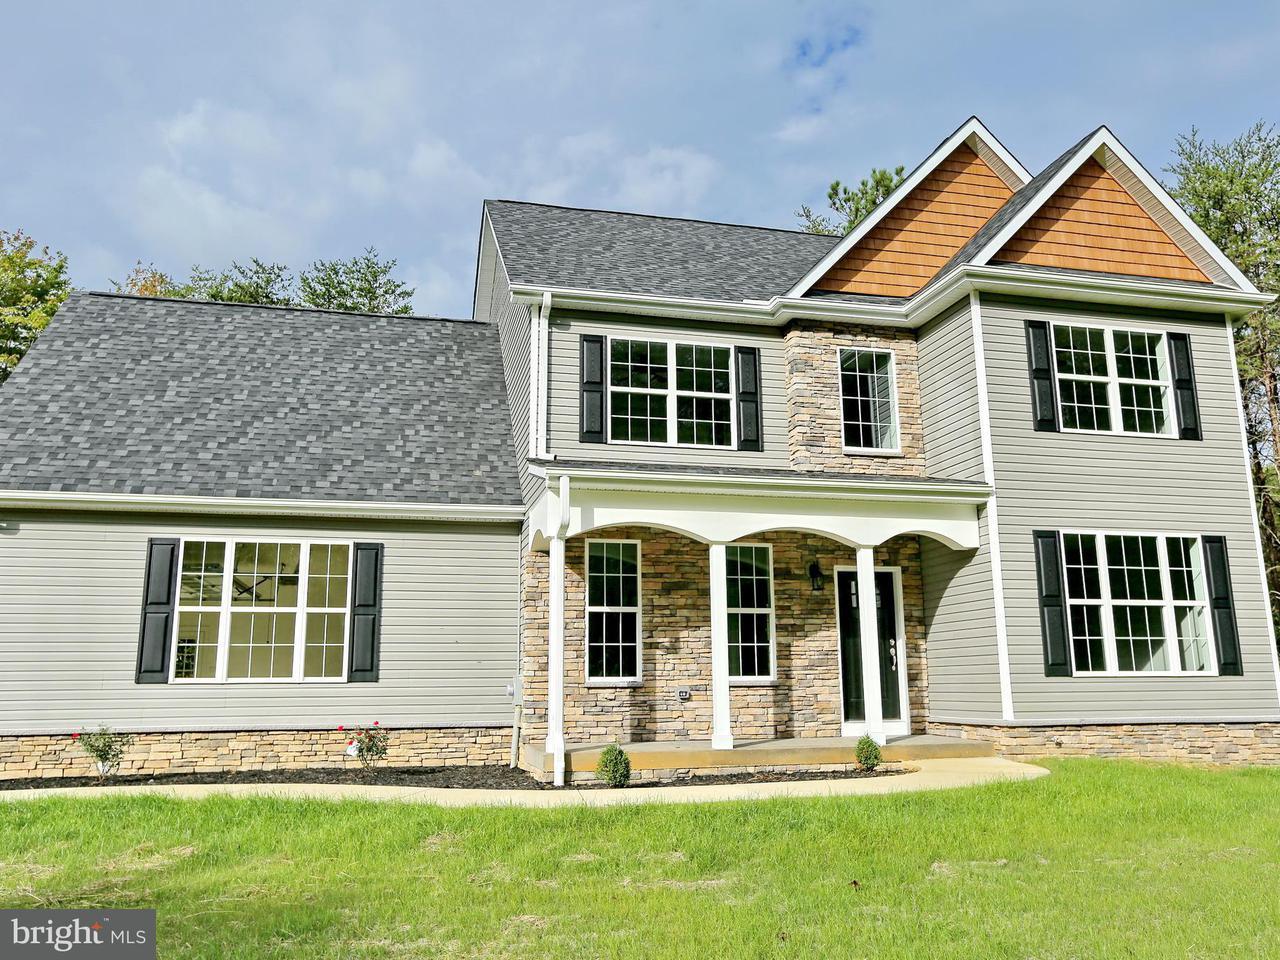 独户住宅 为 销售 在 10275 FAULKNER Road 10275 FAULKNER Road Faulkner, 马里兰州 20632 美国